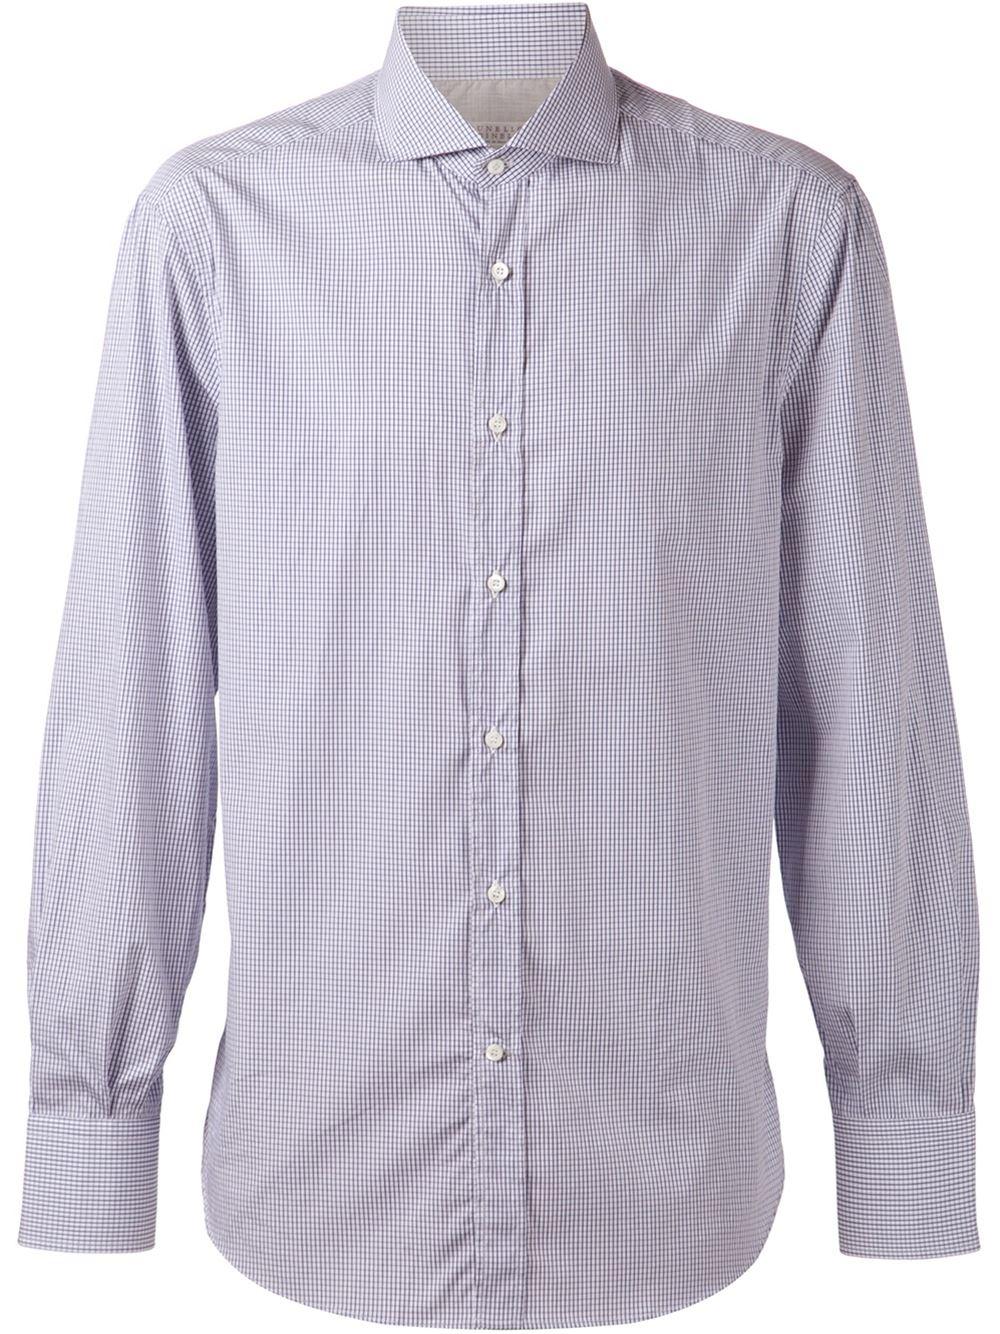 Brunello cucinelli spread collar shirt in blue for men lyst for What is a spread collar shirt